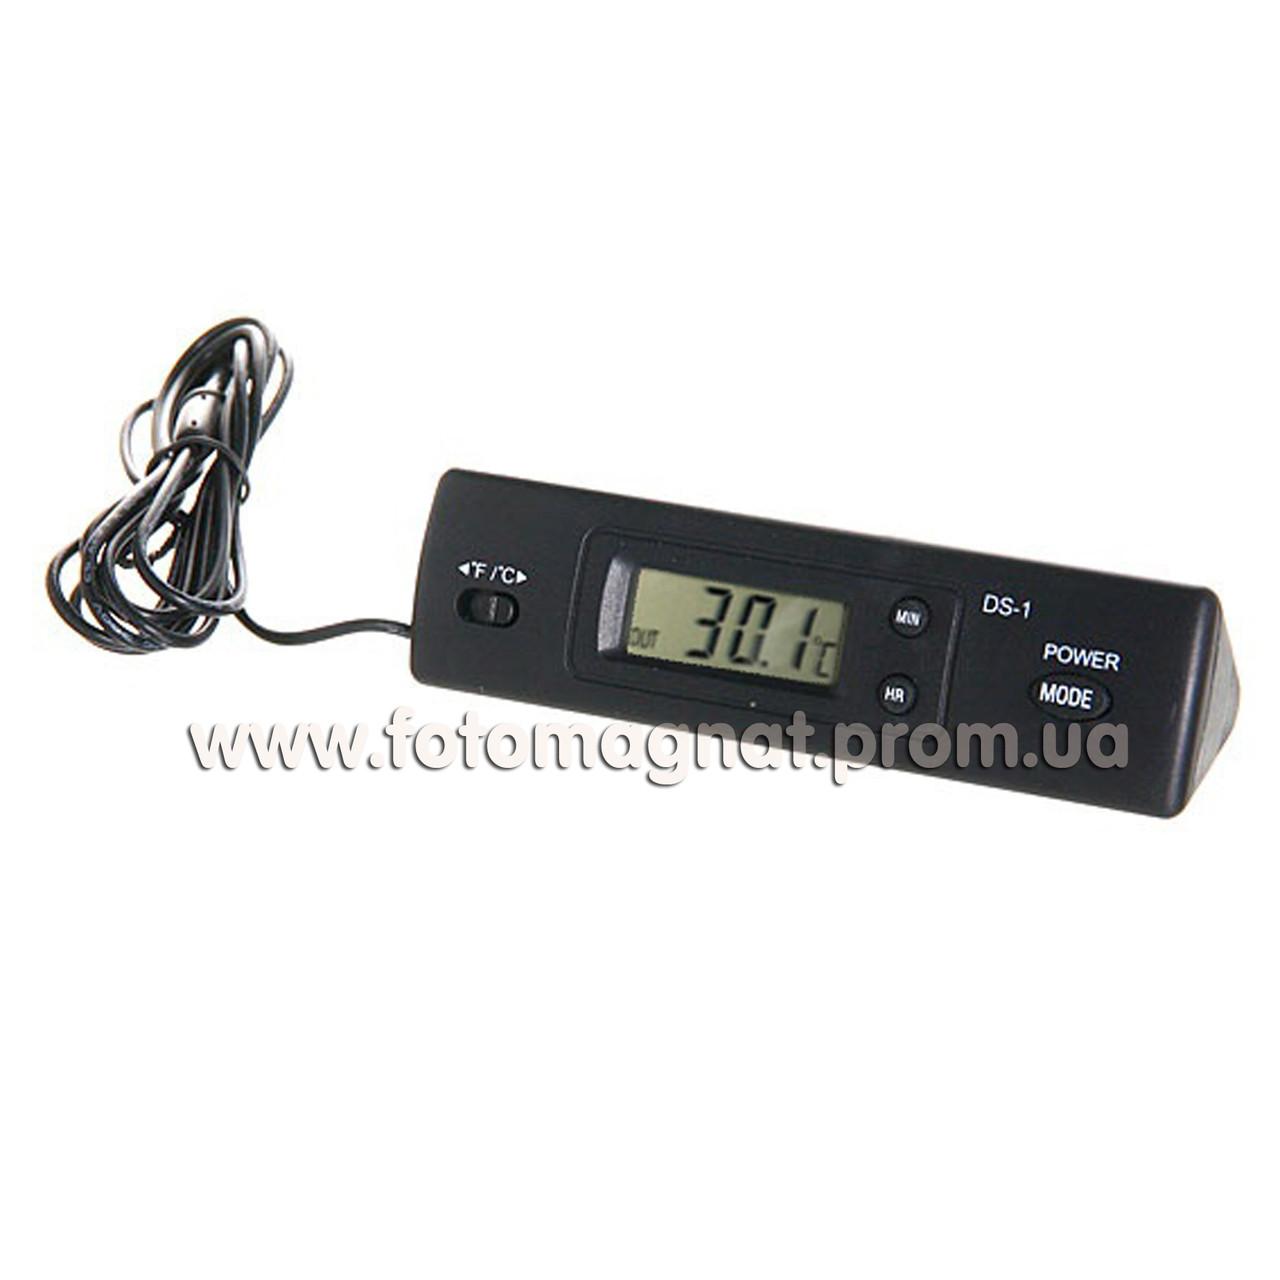 Термометр DS-1 (цифровой термометр)